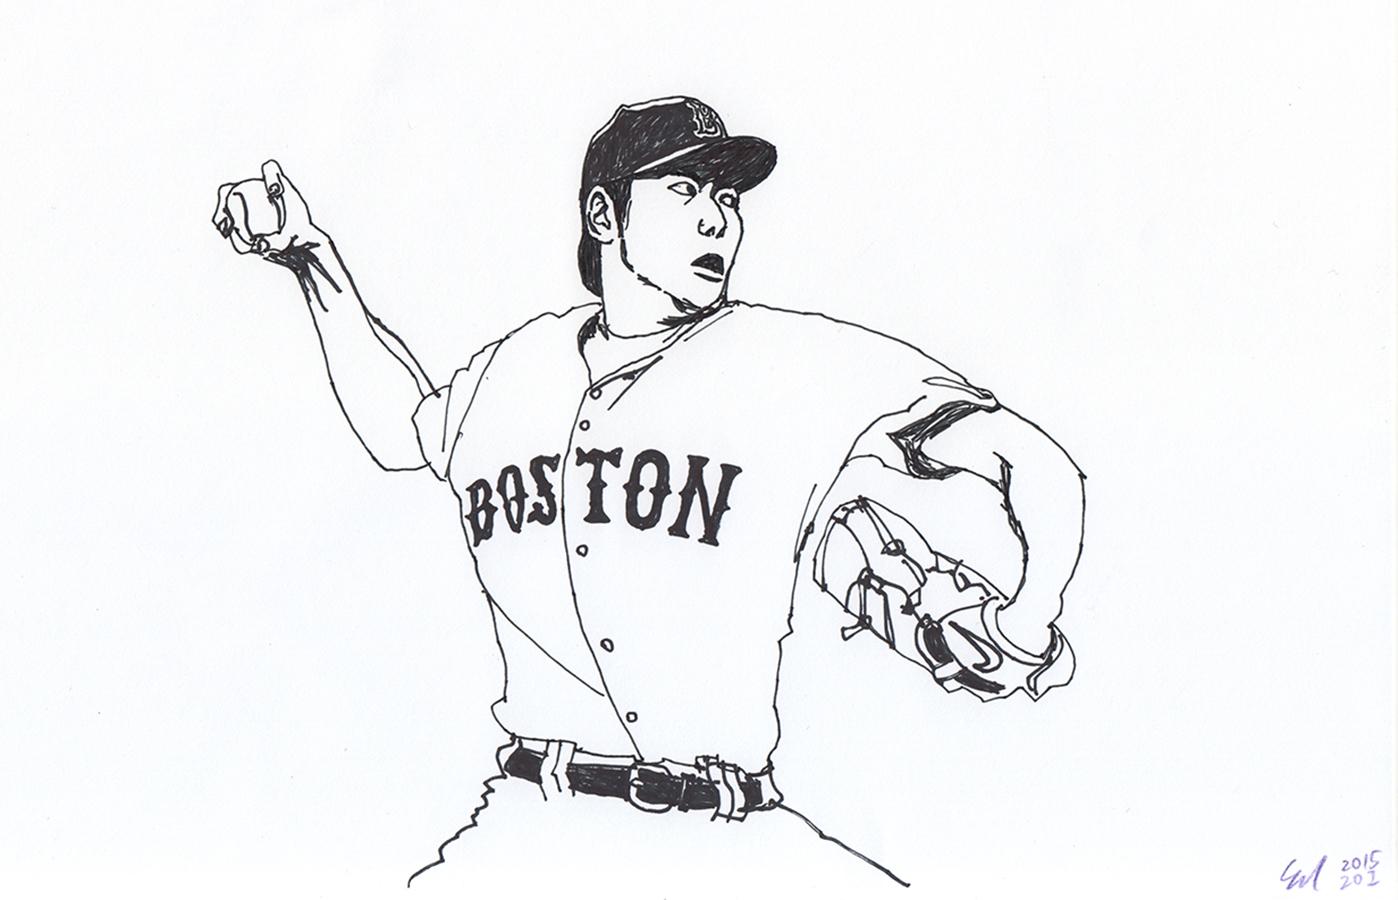 illustration of Boston Red Sox Koji Uehara's pitching